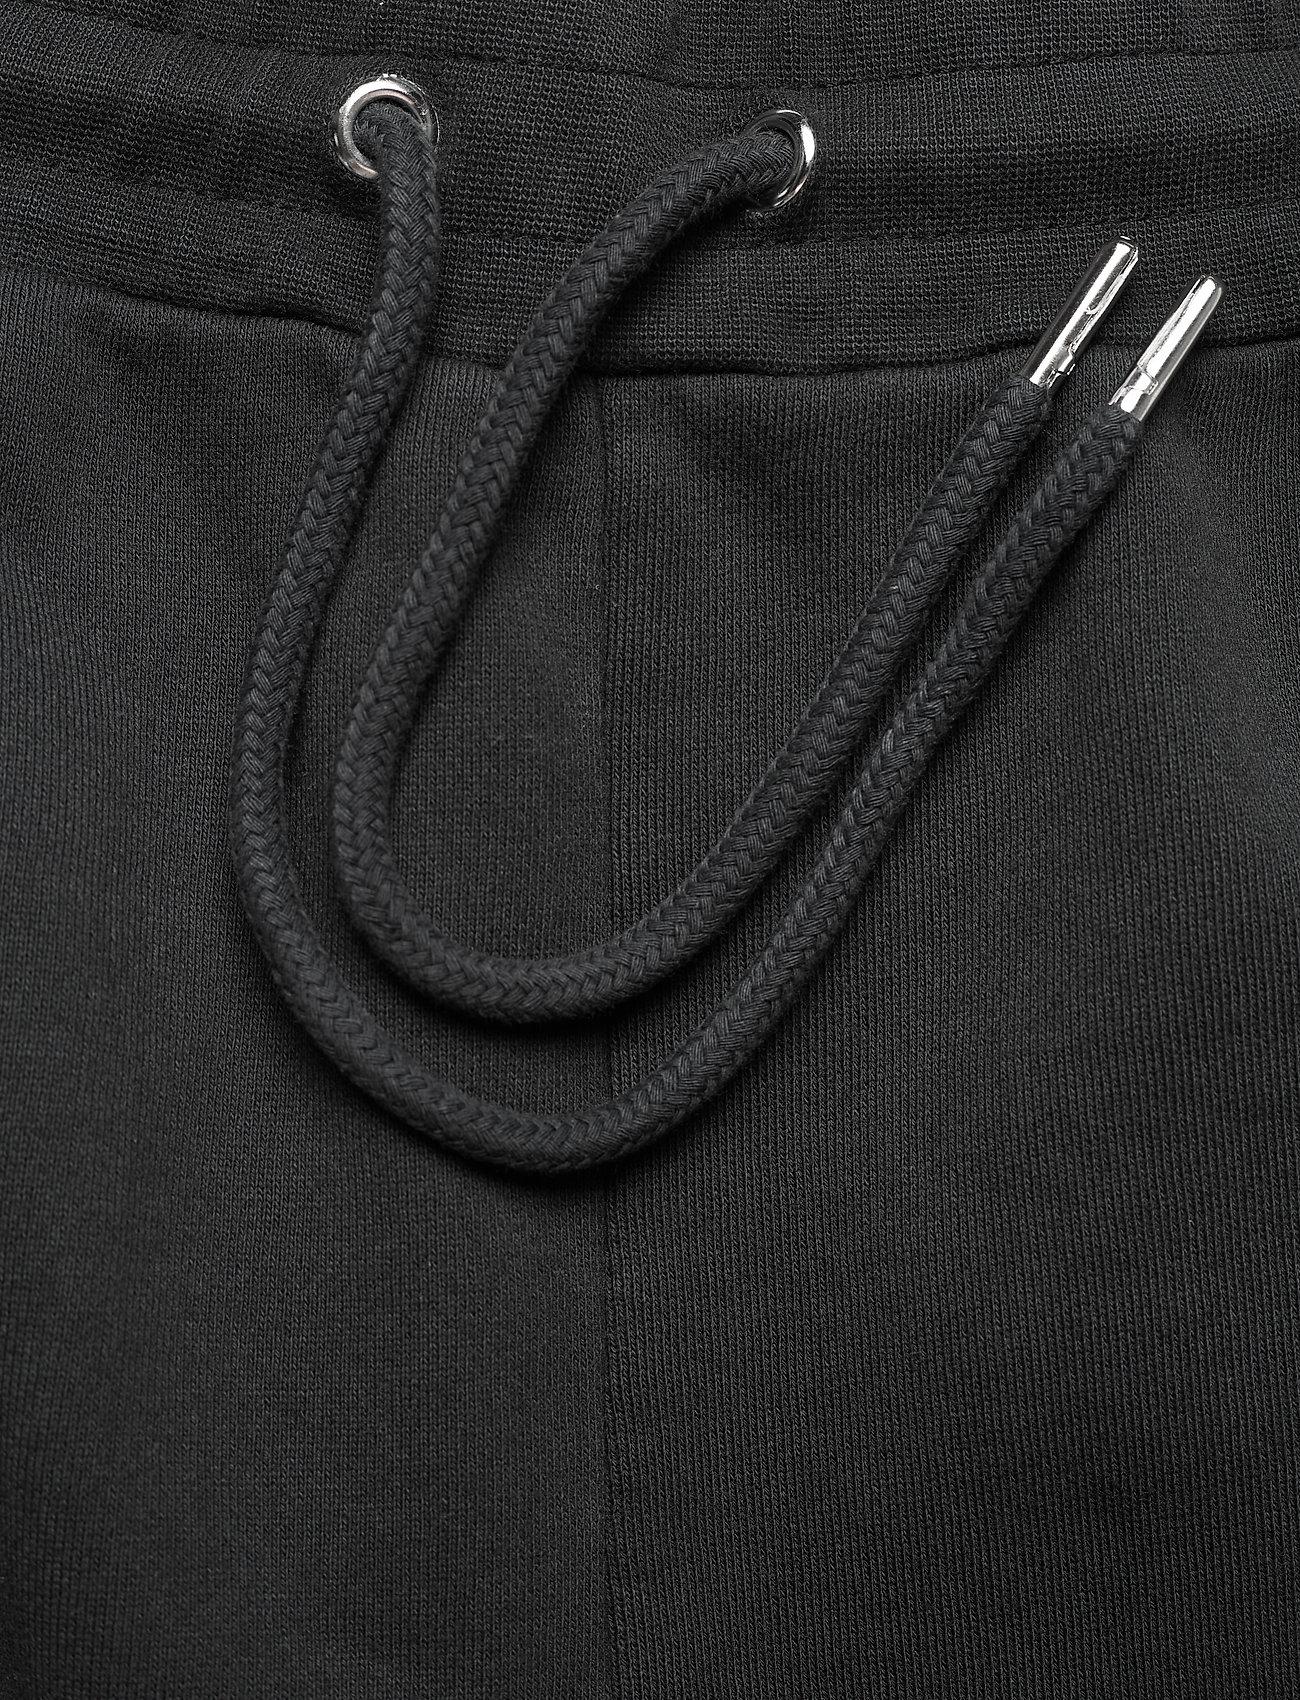 HAN Kjøbenhavn - Sweat Shorts - casual shorts - faded black - 6